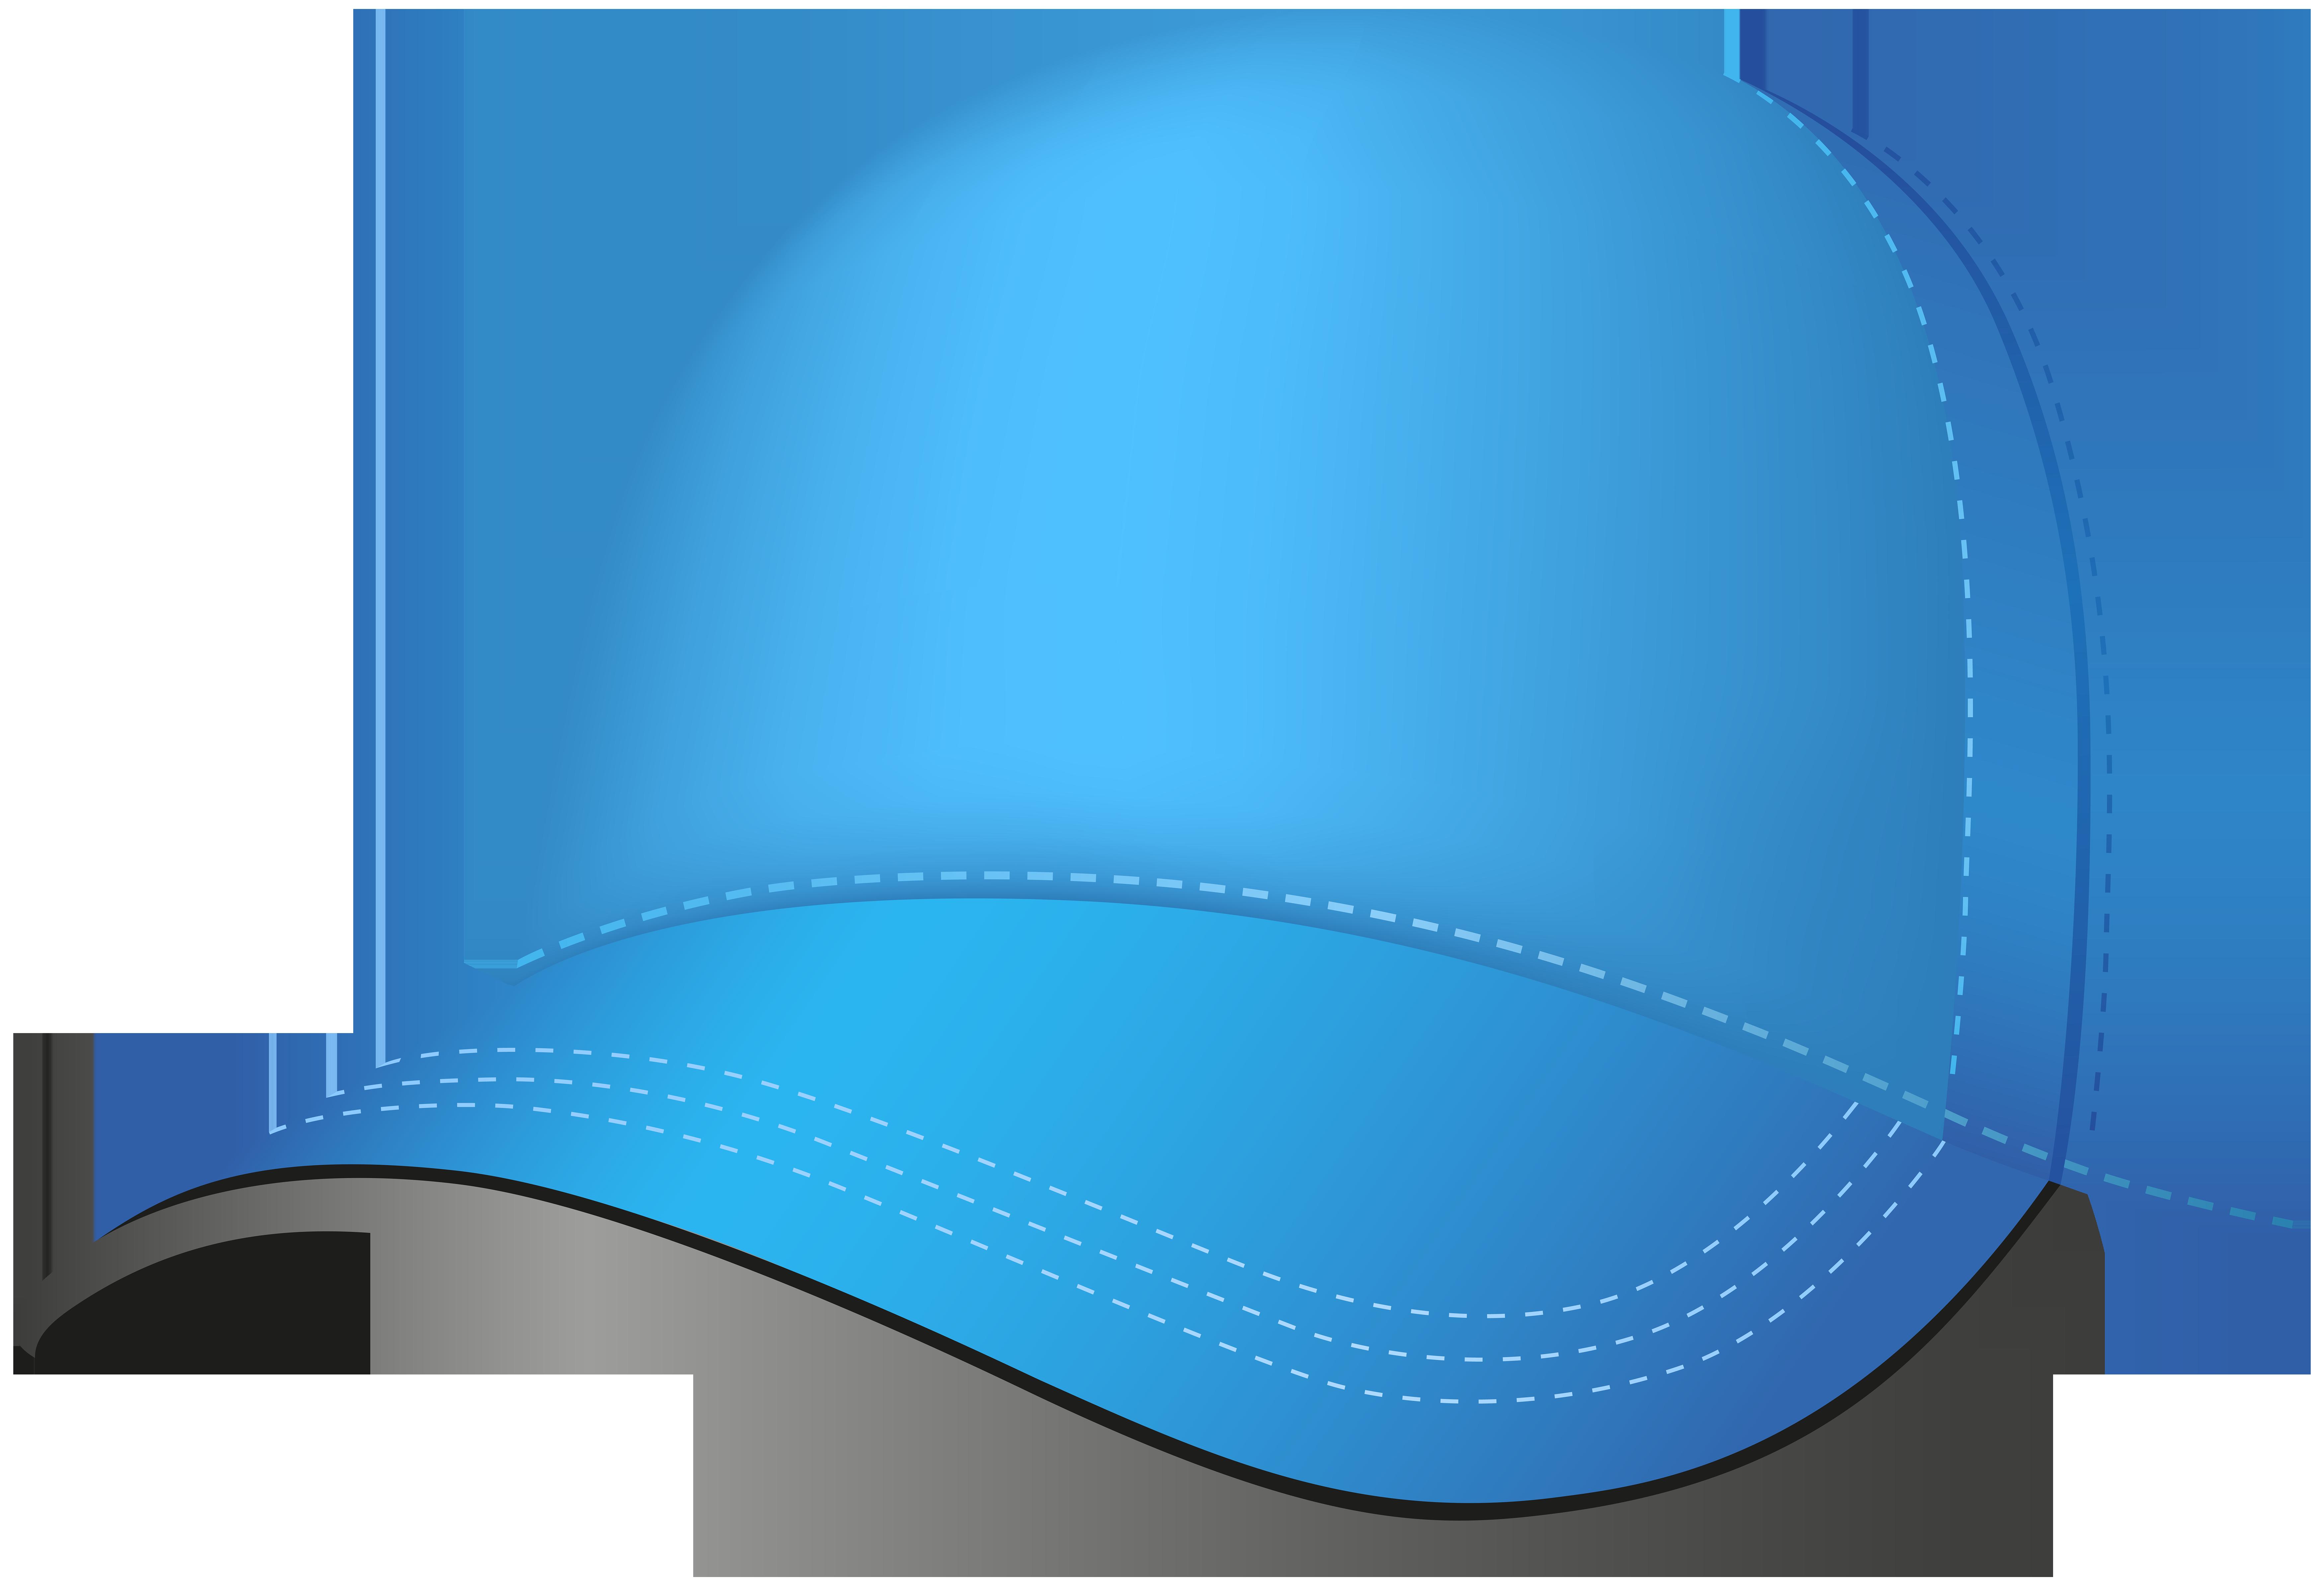 Blue baseball cap png. Number 1 clipart 1blue